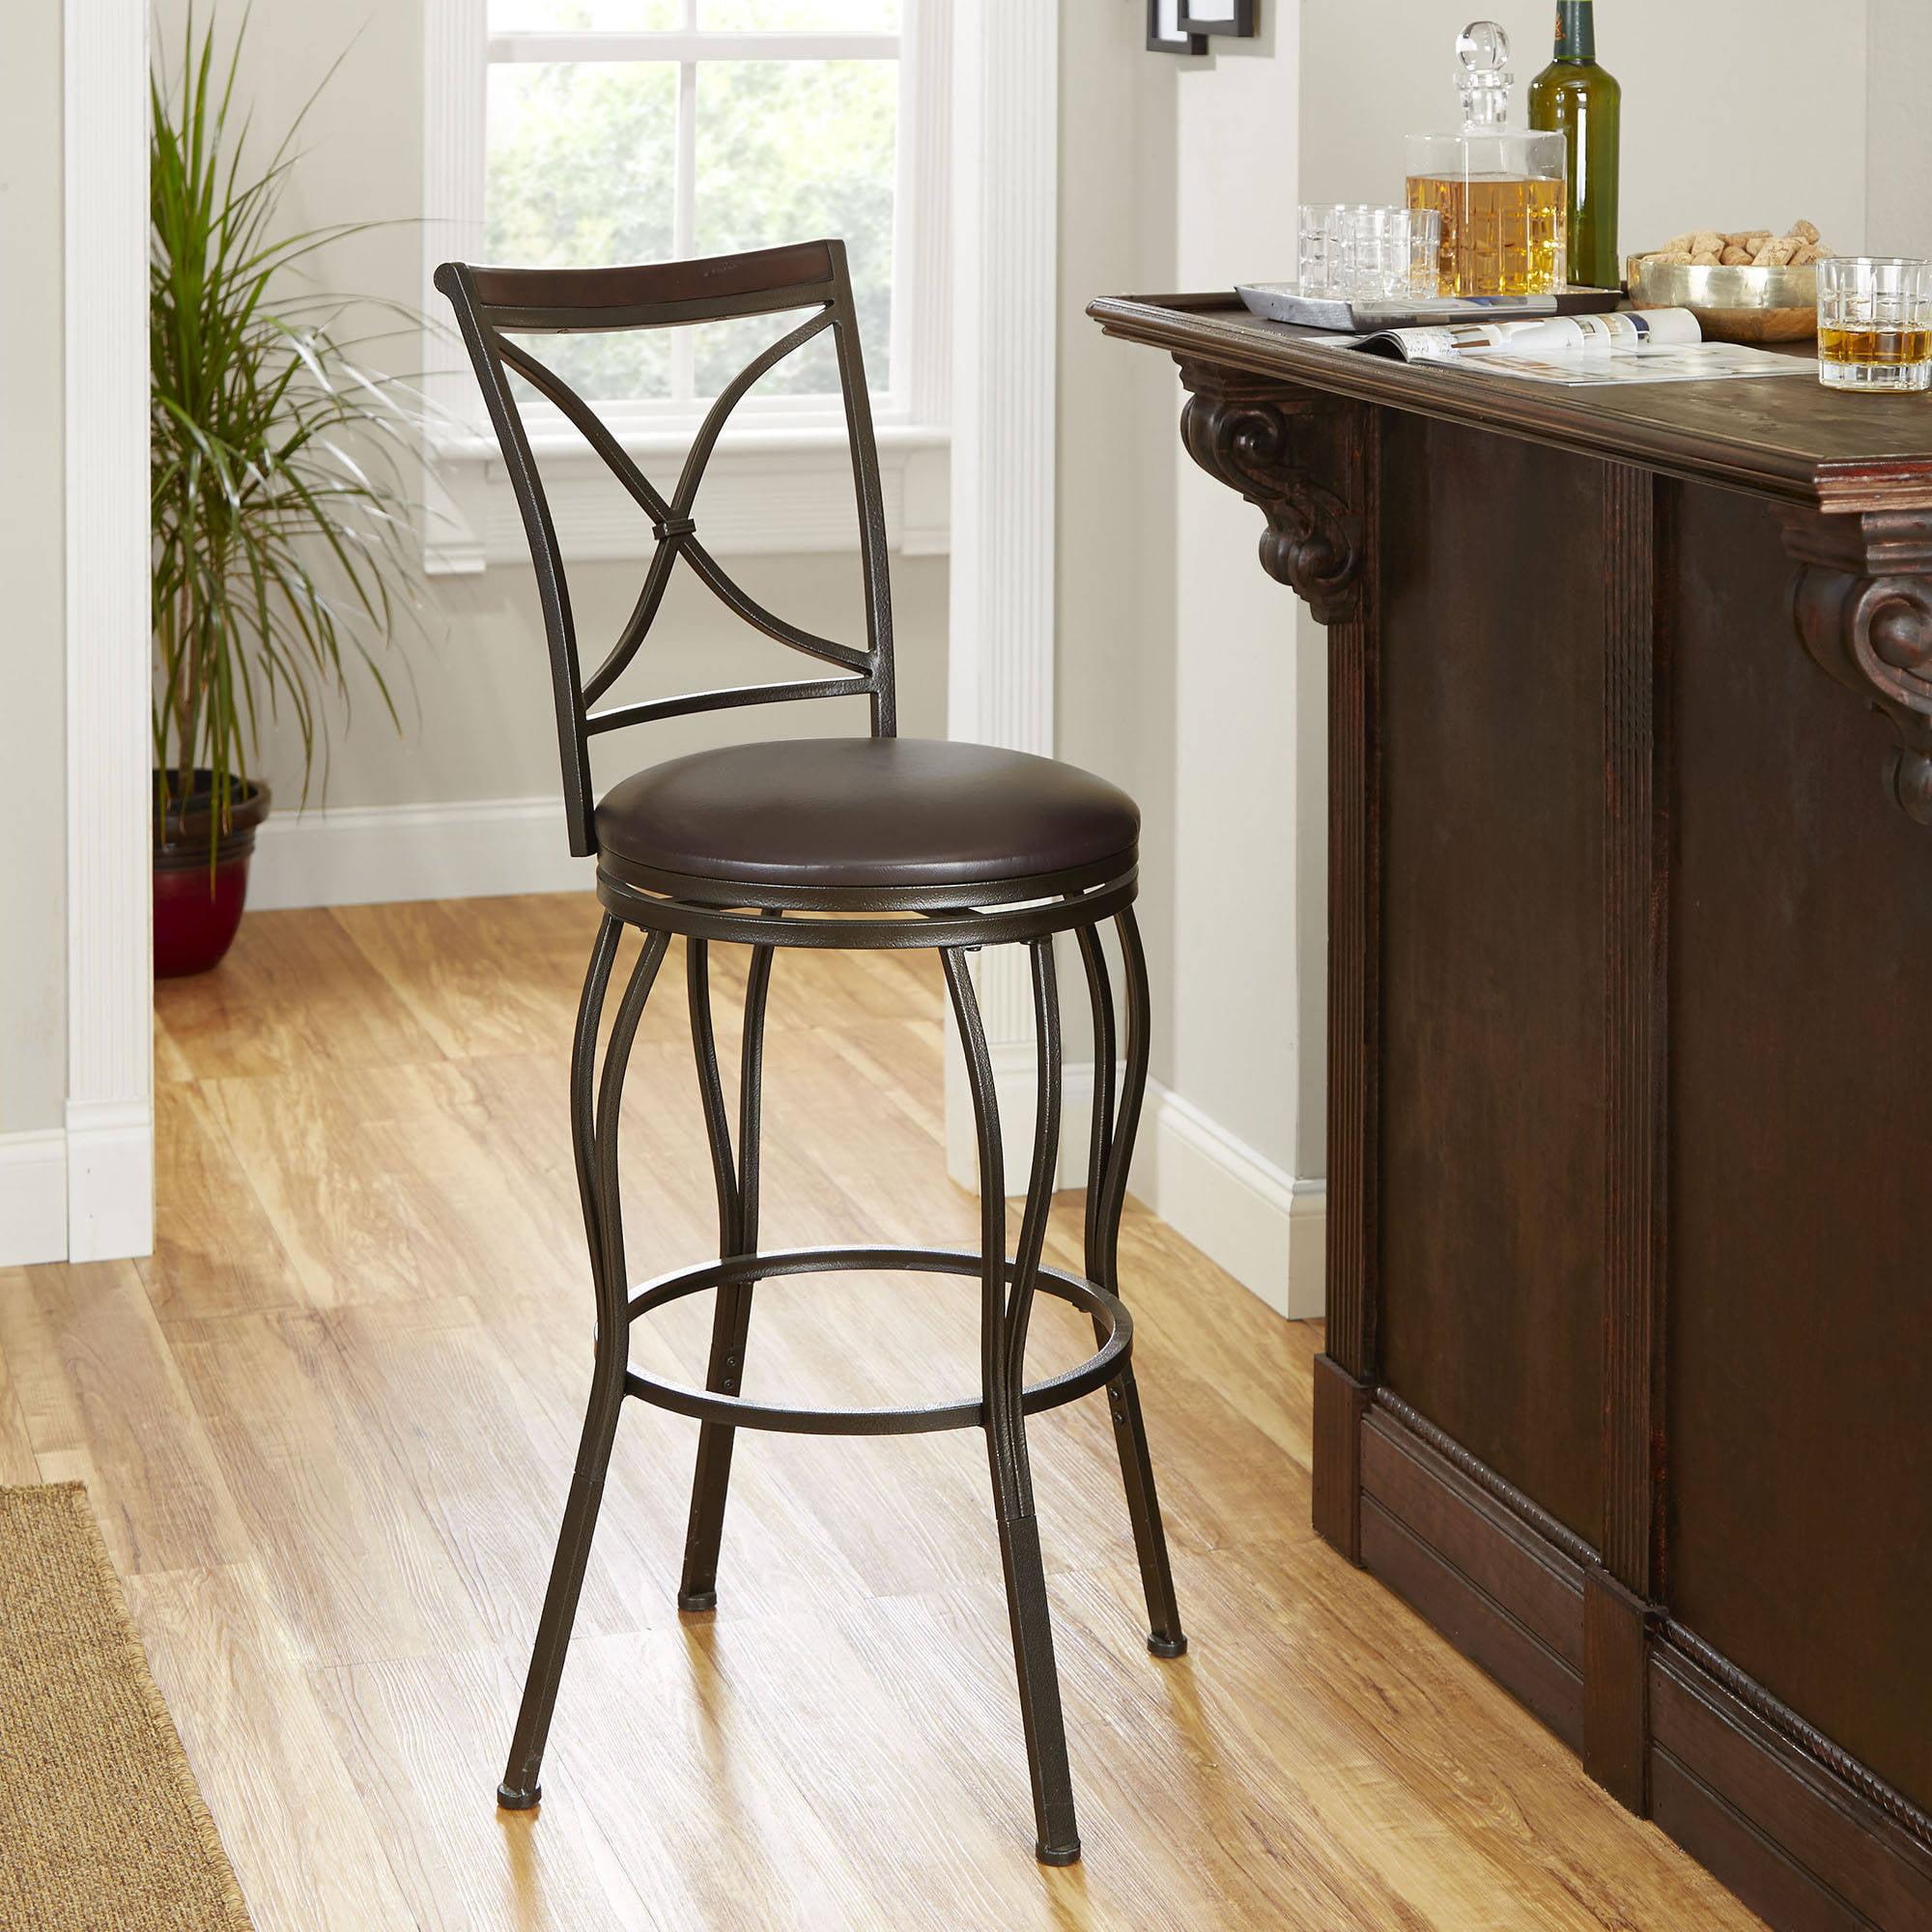 Cameron Adjustable Height Barstool With Swivel Seat   Walmart.com